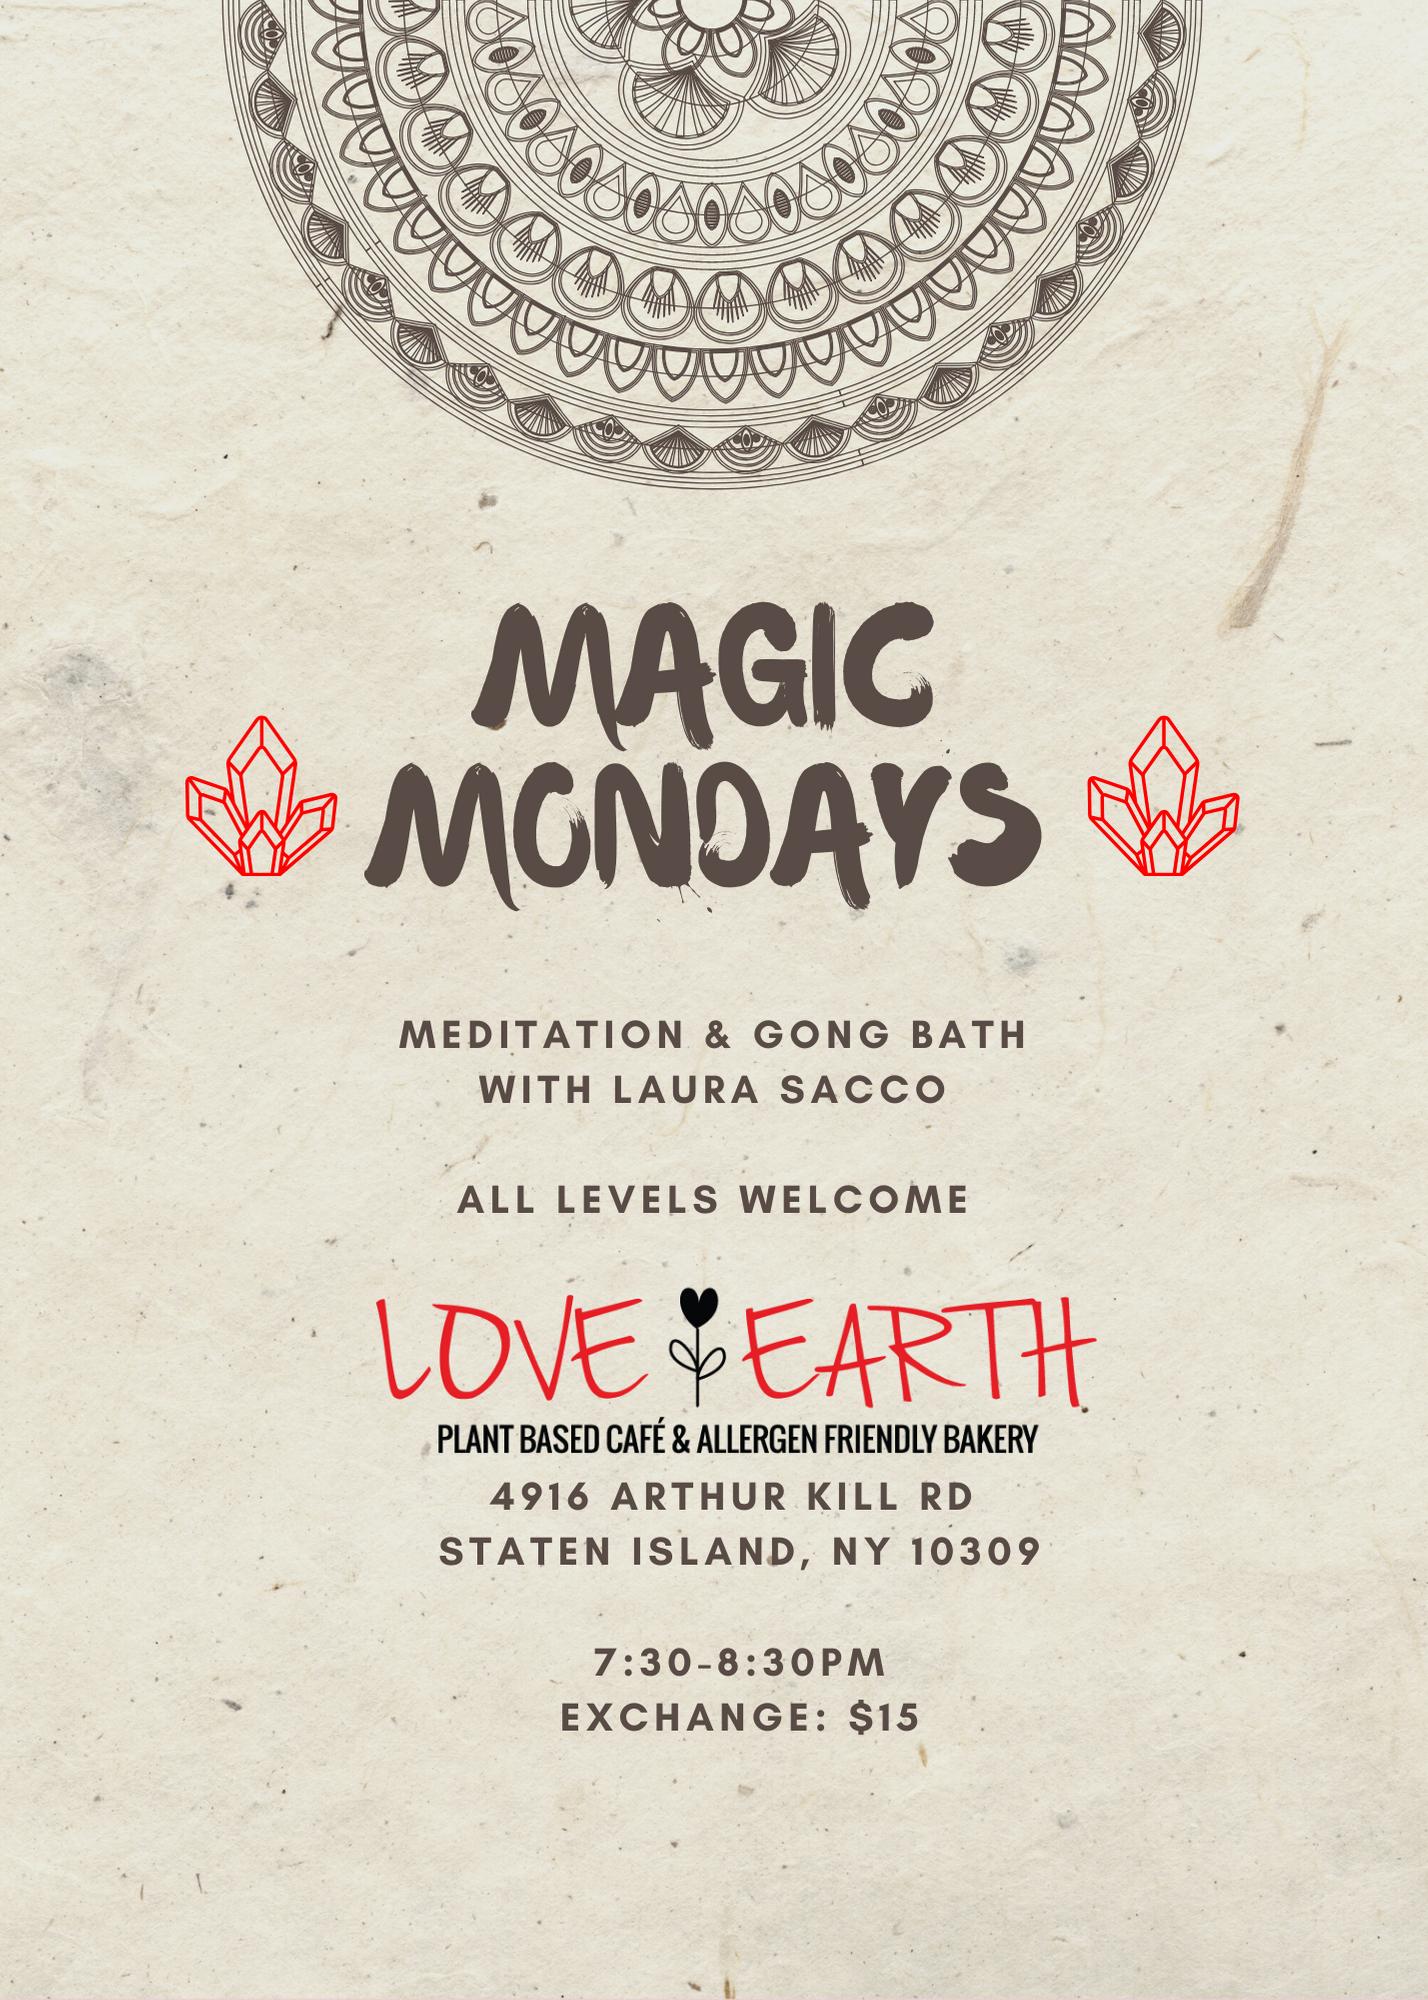 Magic Mondays: Meditation & Gong Bath